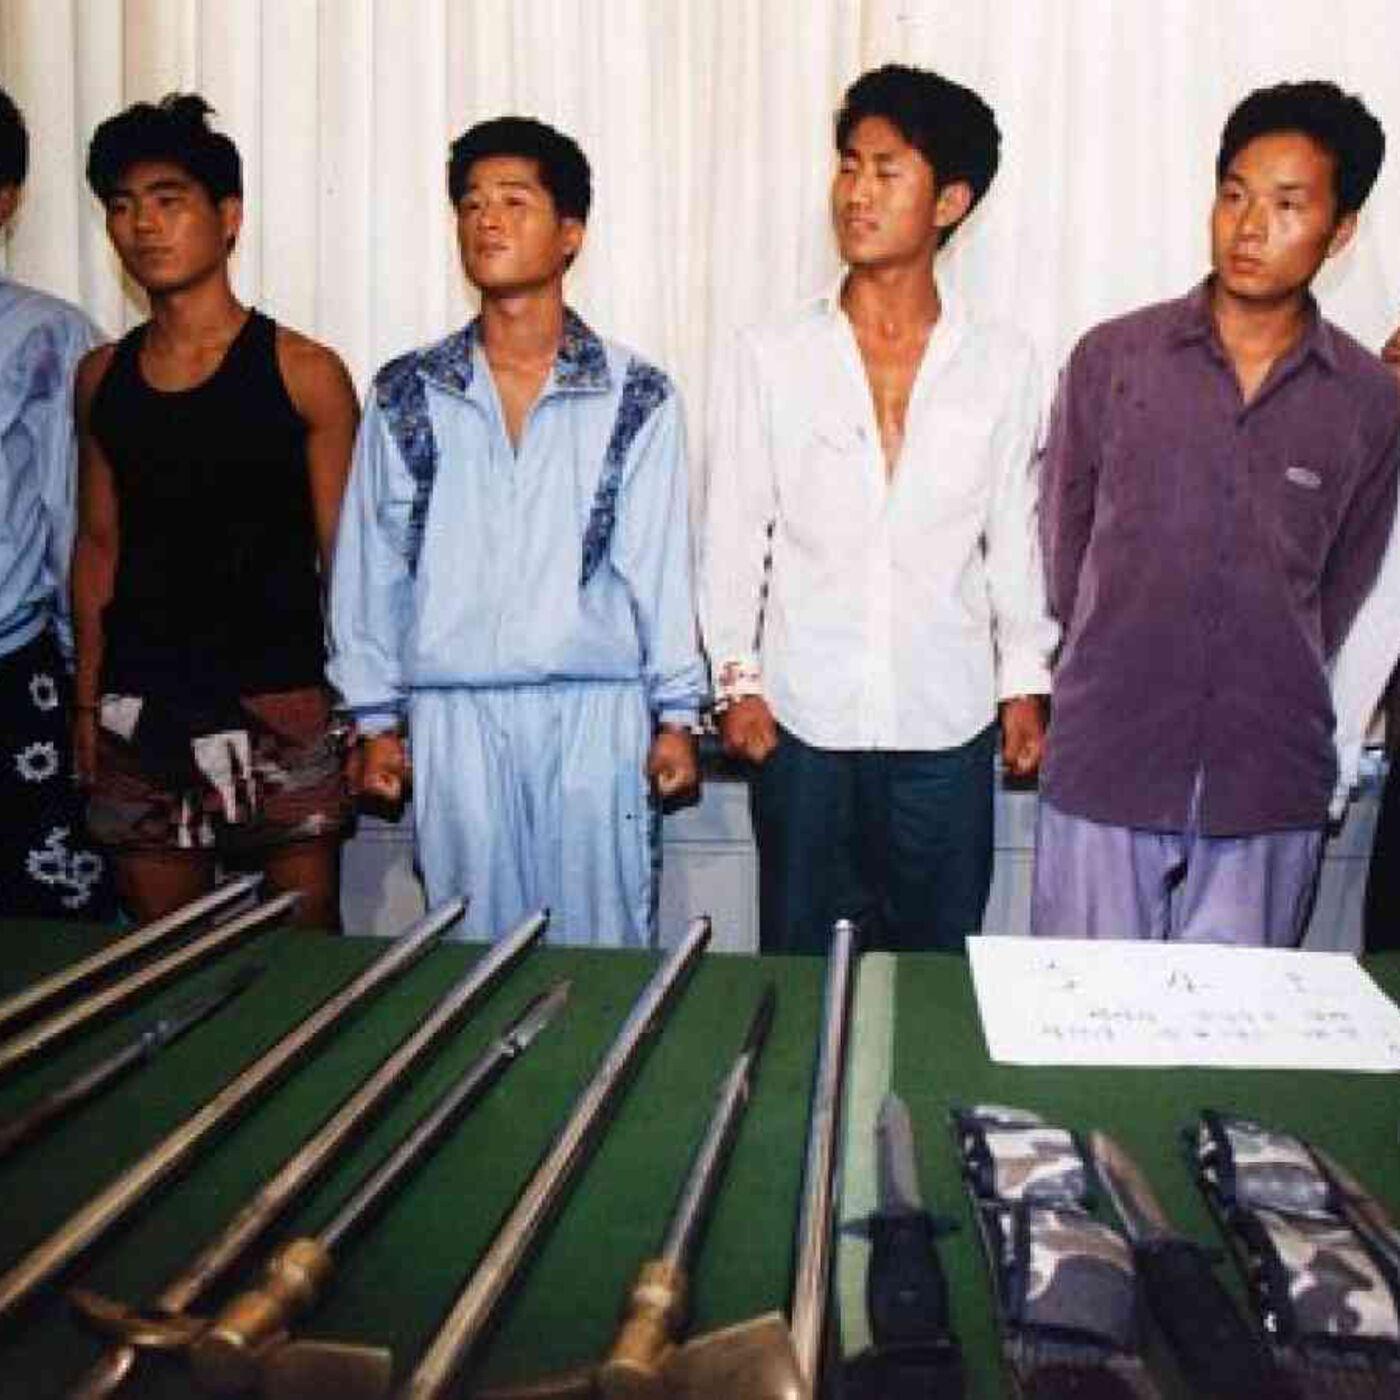 True Crime: The Jijon Family